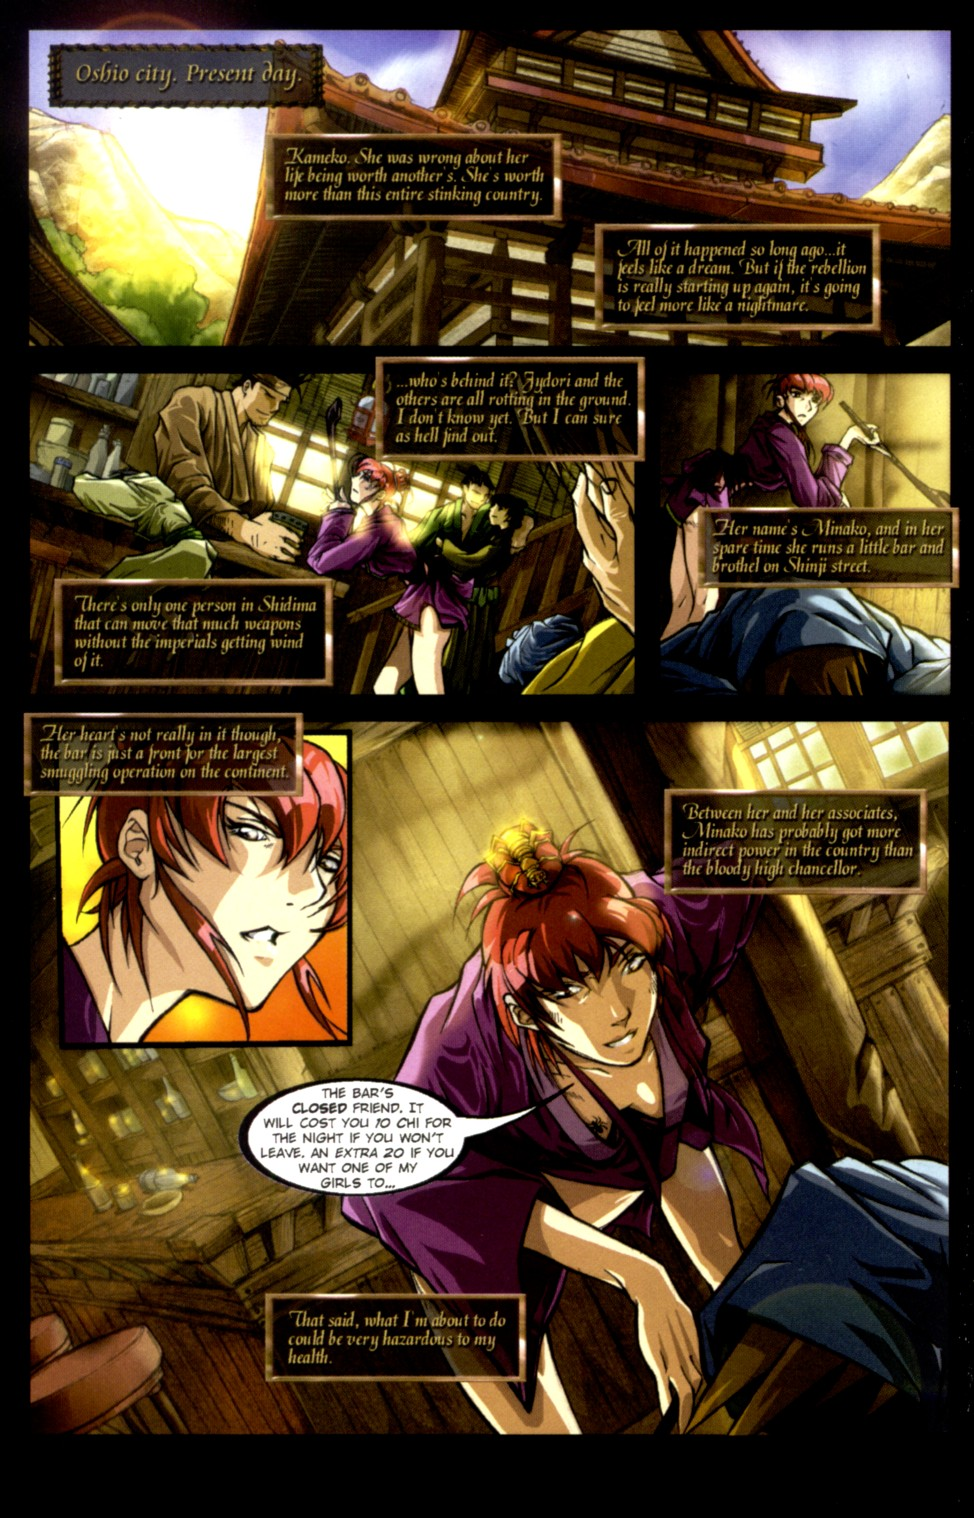 Read online Shidima comic -  Issue #1 - 22